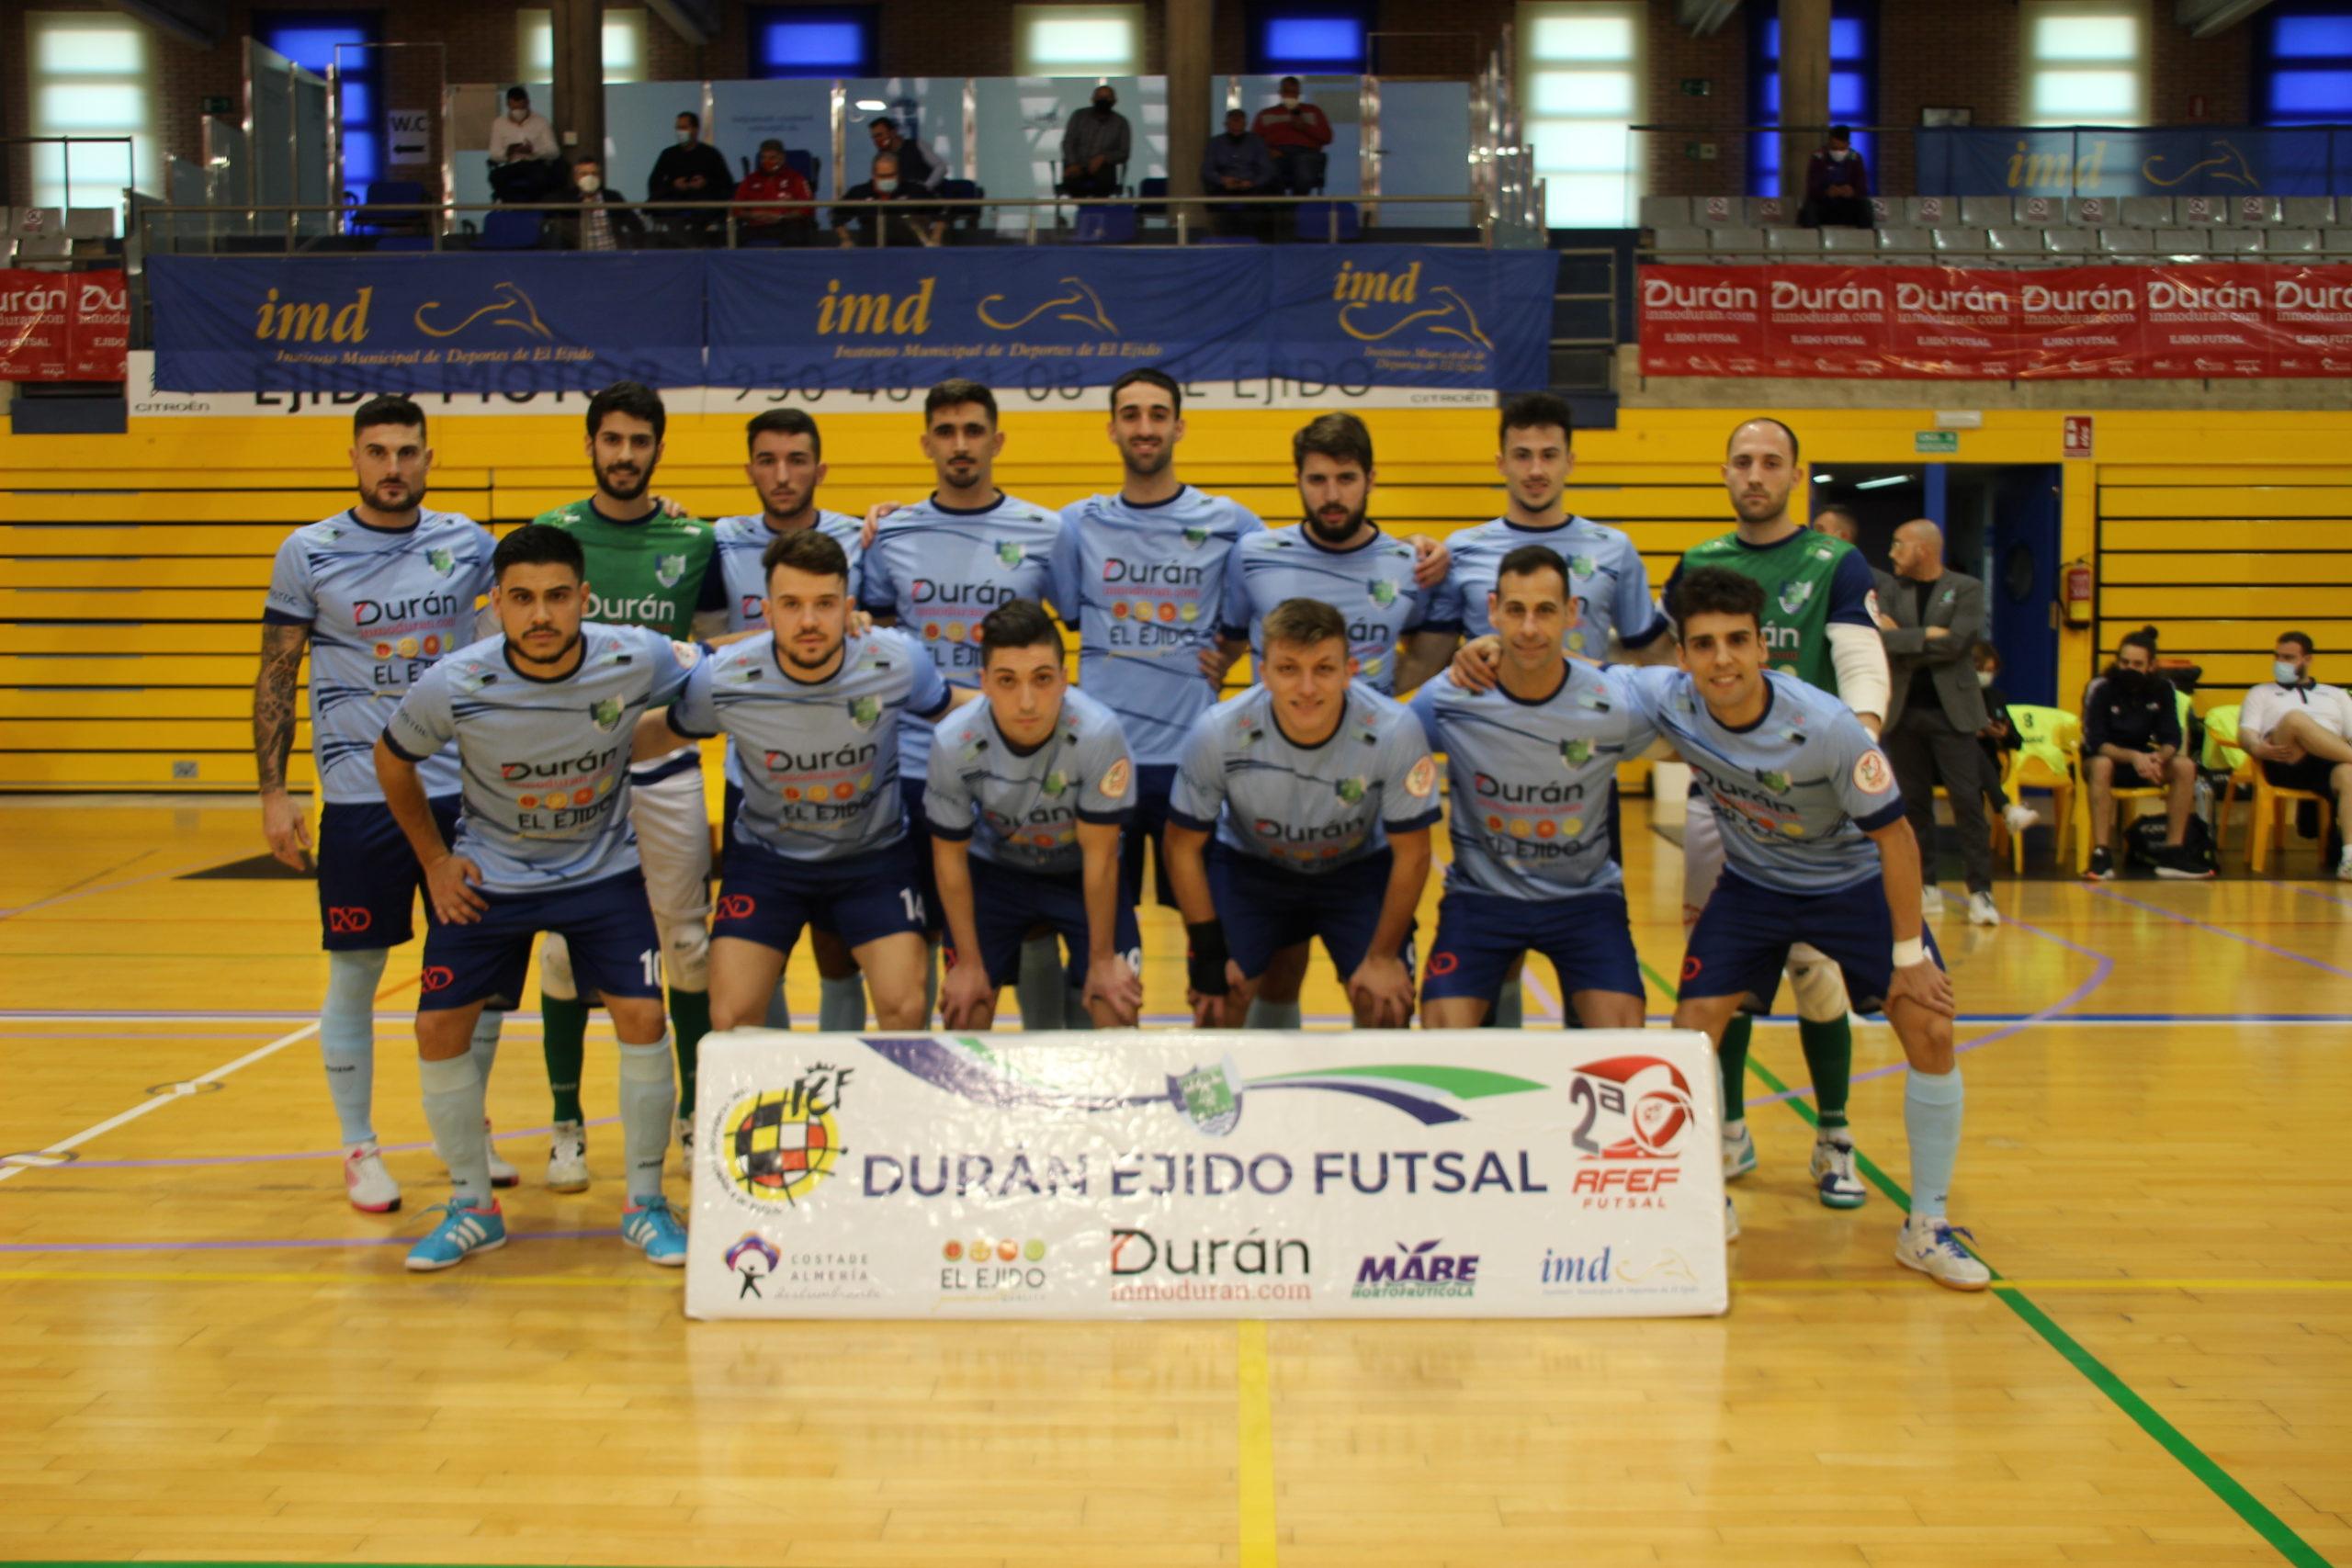 Durán Ejido Futsal, clasificado para la fase de ascenso